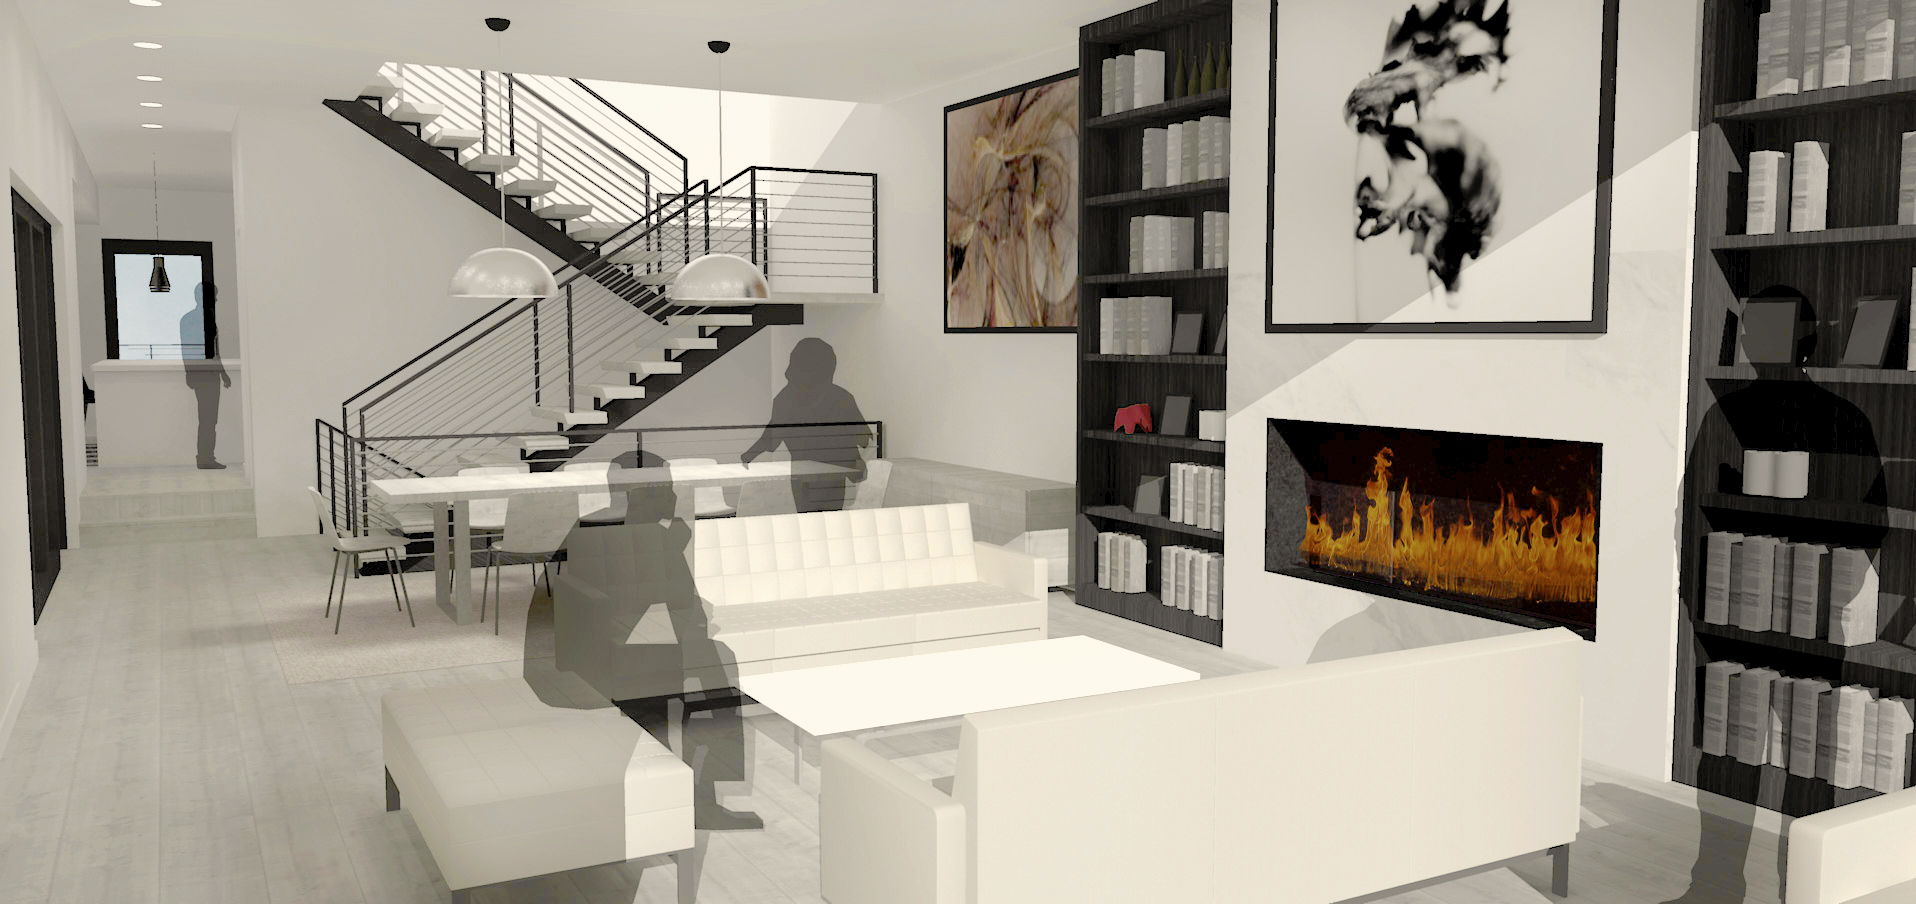 1860 North Maud Chicago Interior Render Living Room TARIS Real Estate